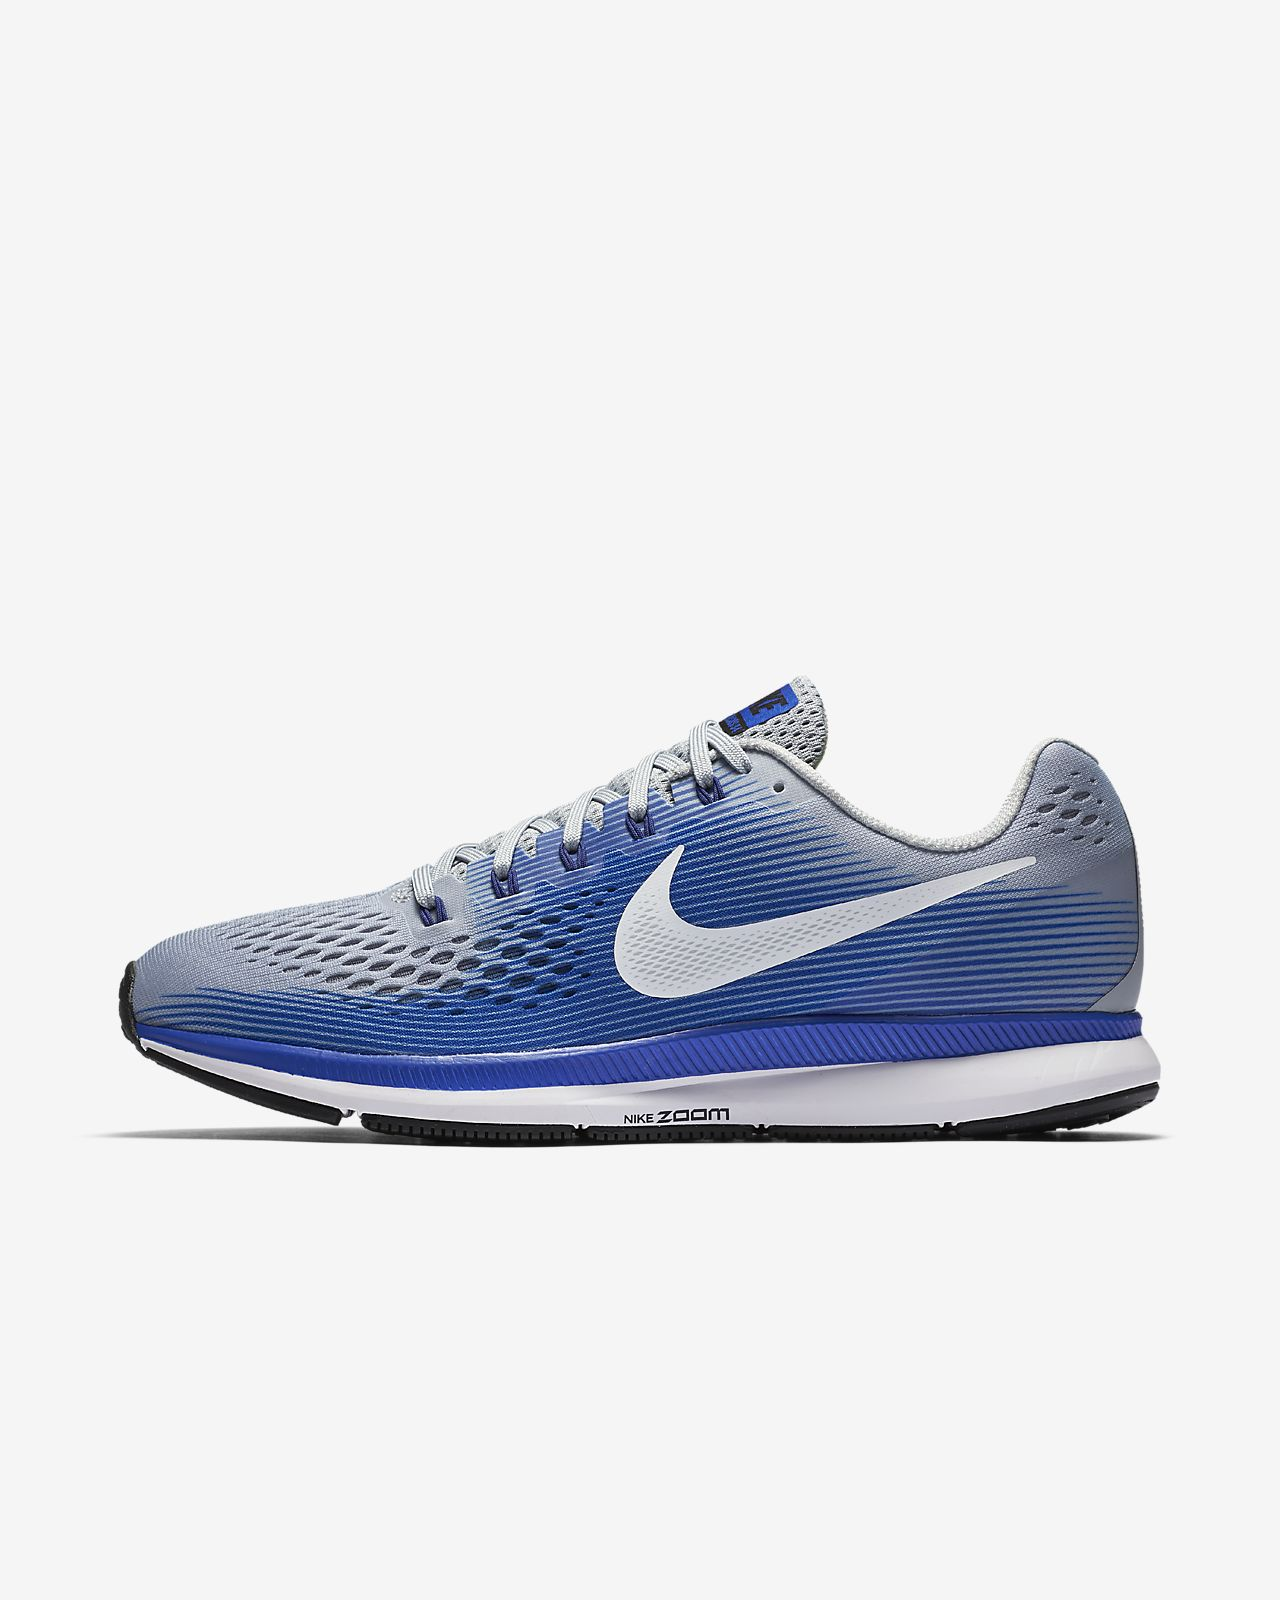 ... Chaussure de running Nike Air Zoom Pegasus 34 pour Homme